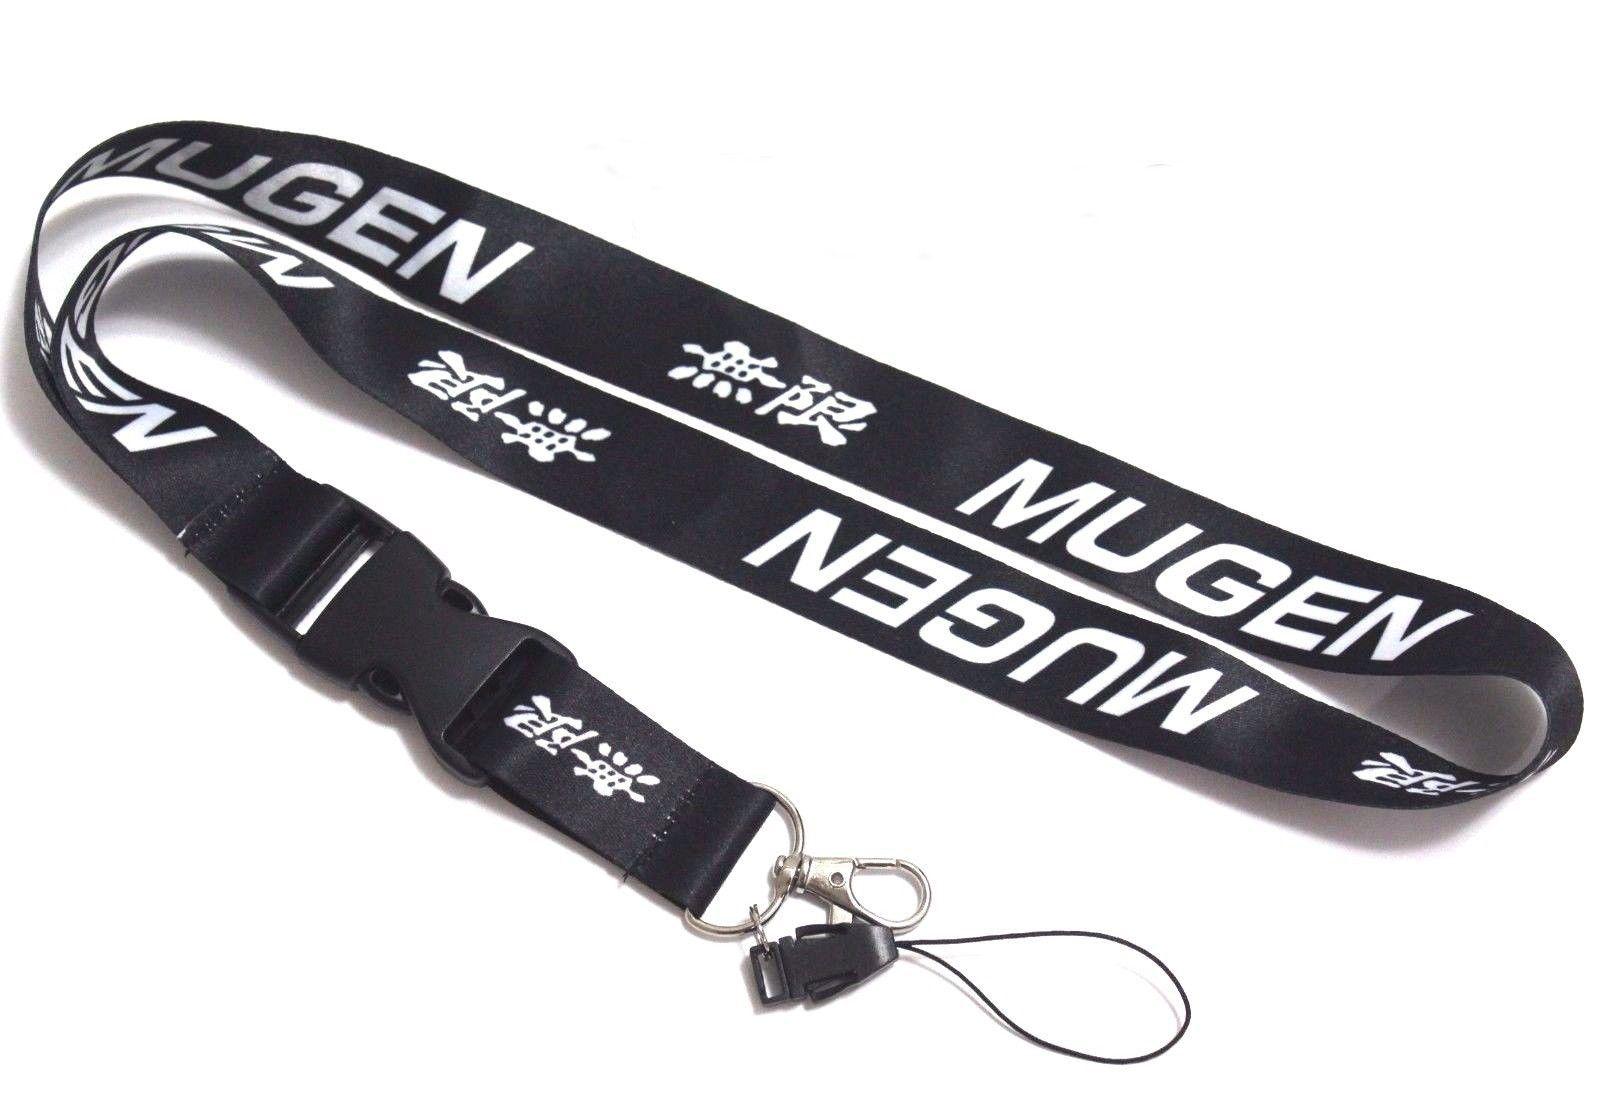 Mugen Jdm Lanyard Neck Key Chain Strap Quick Release Honda Acura - Acura lanyard